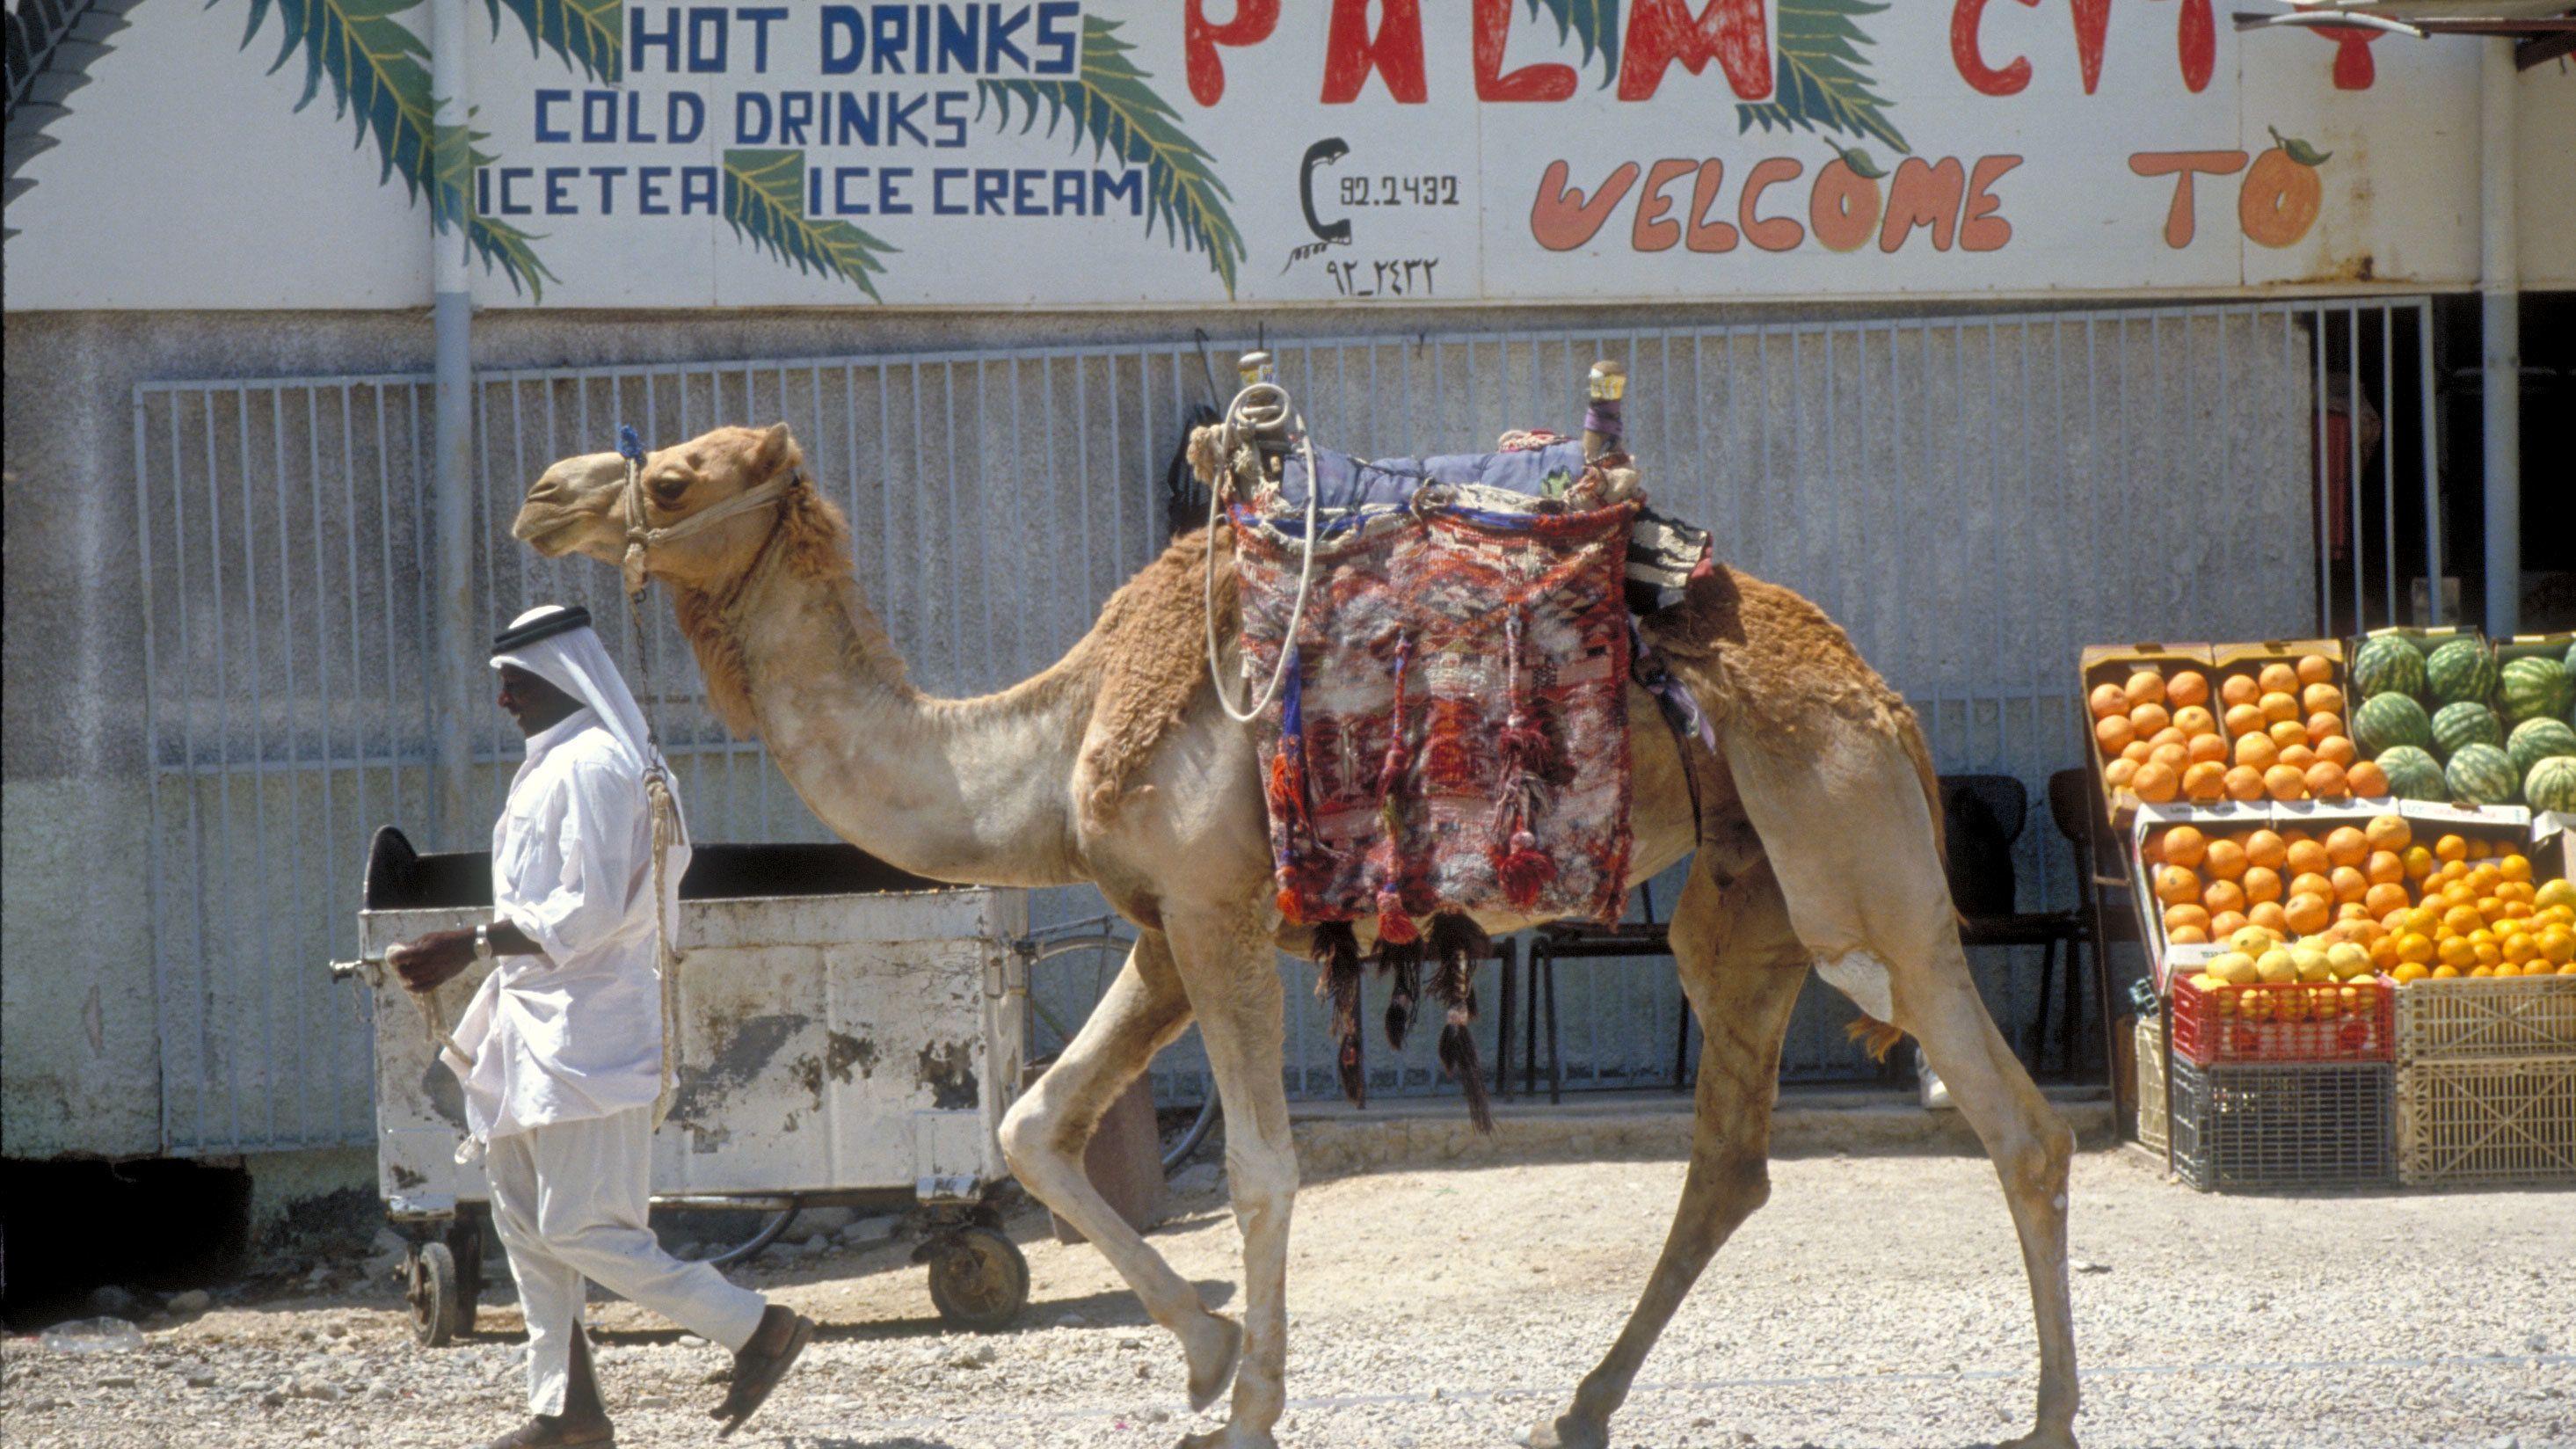 A man leading a camel down a street in Bethlehm